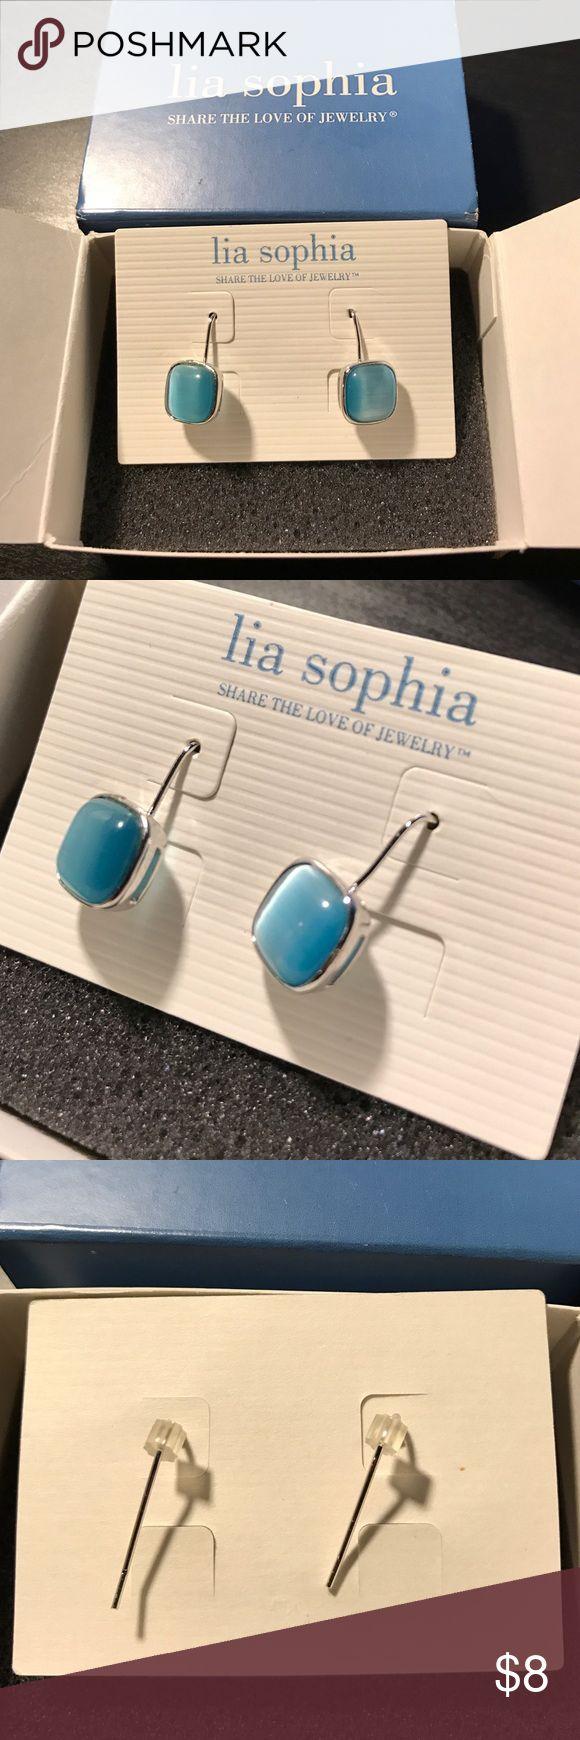 Lia Sophia earrings Brand new, never worn. Blue and silver Lia Sophia Jewelry Earrings